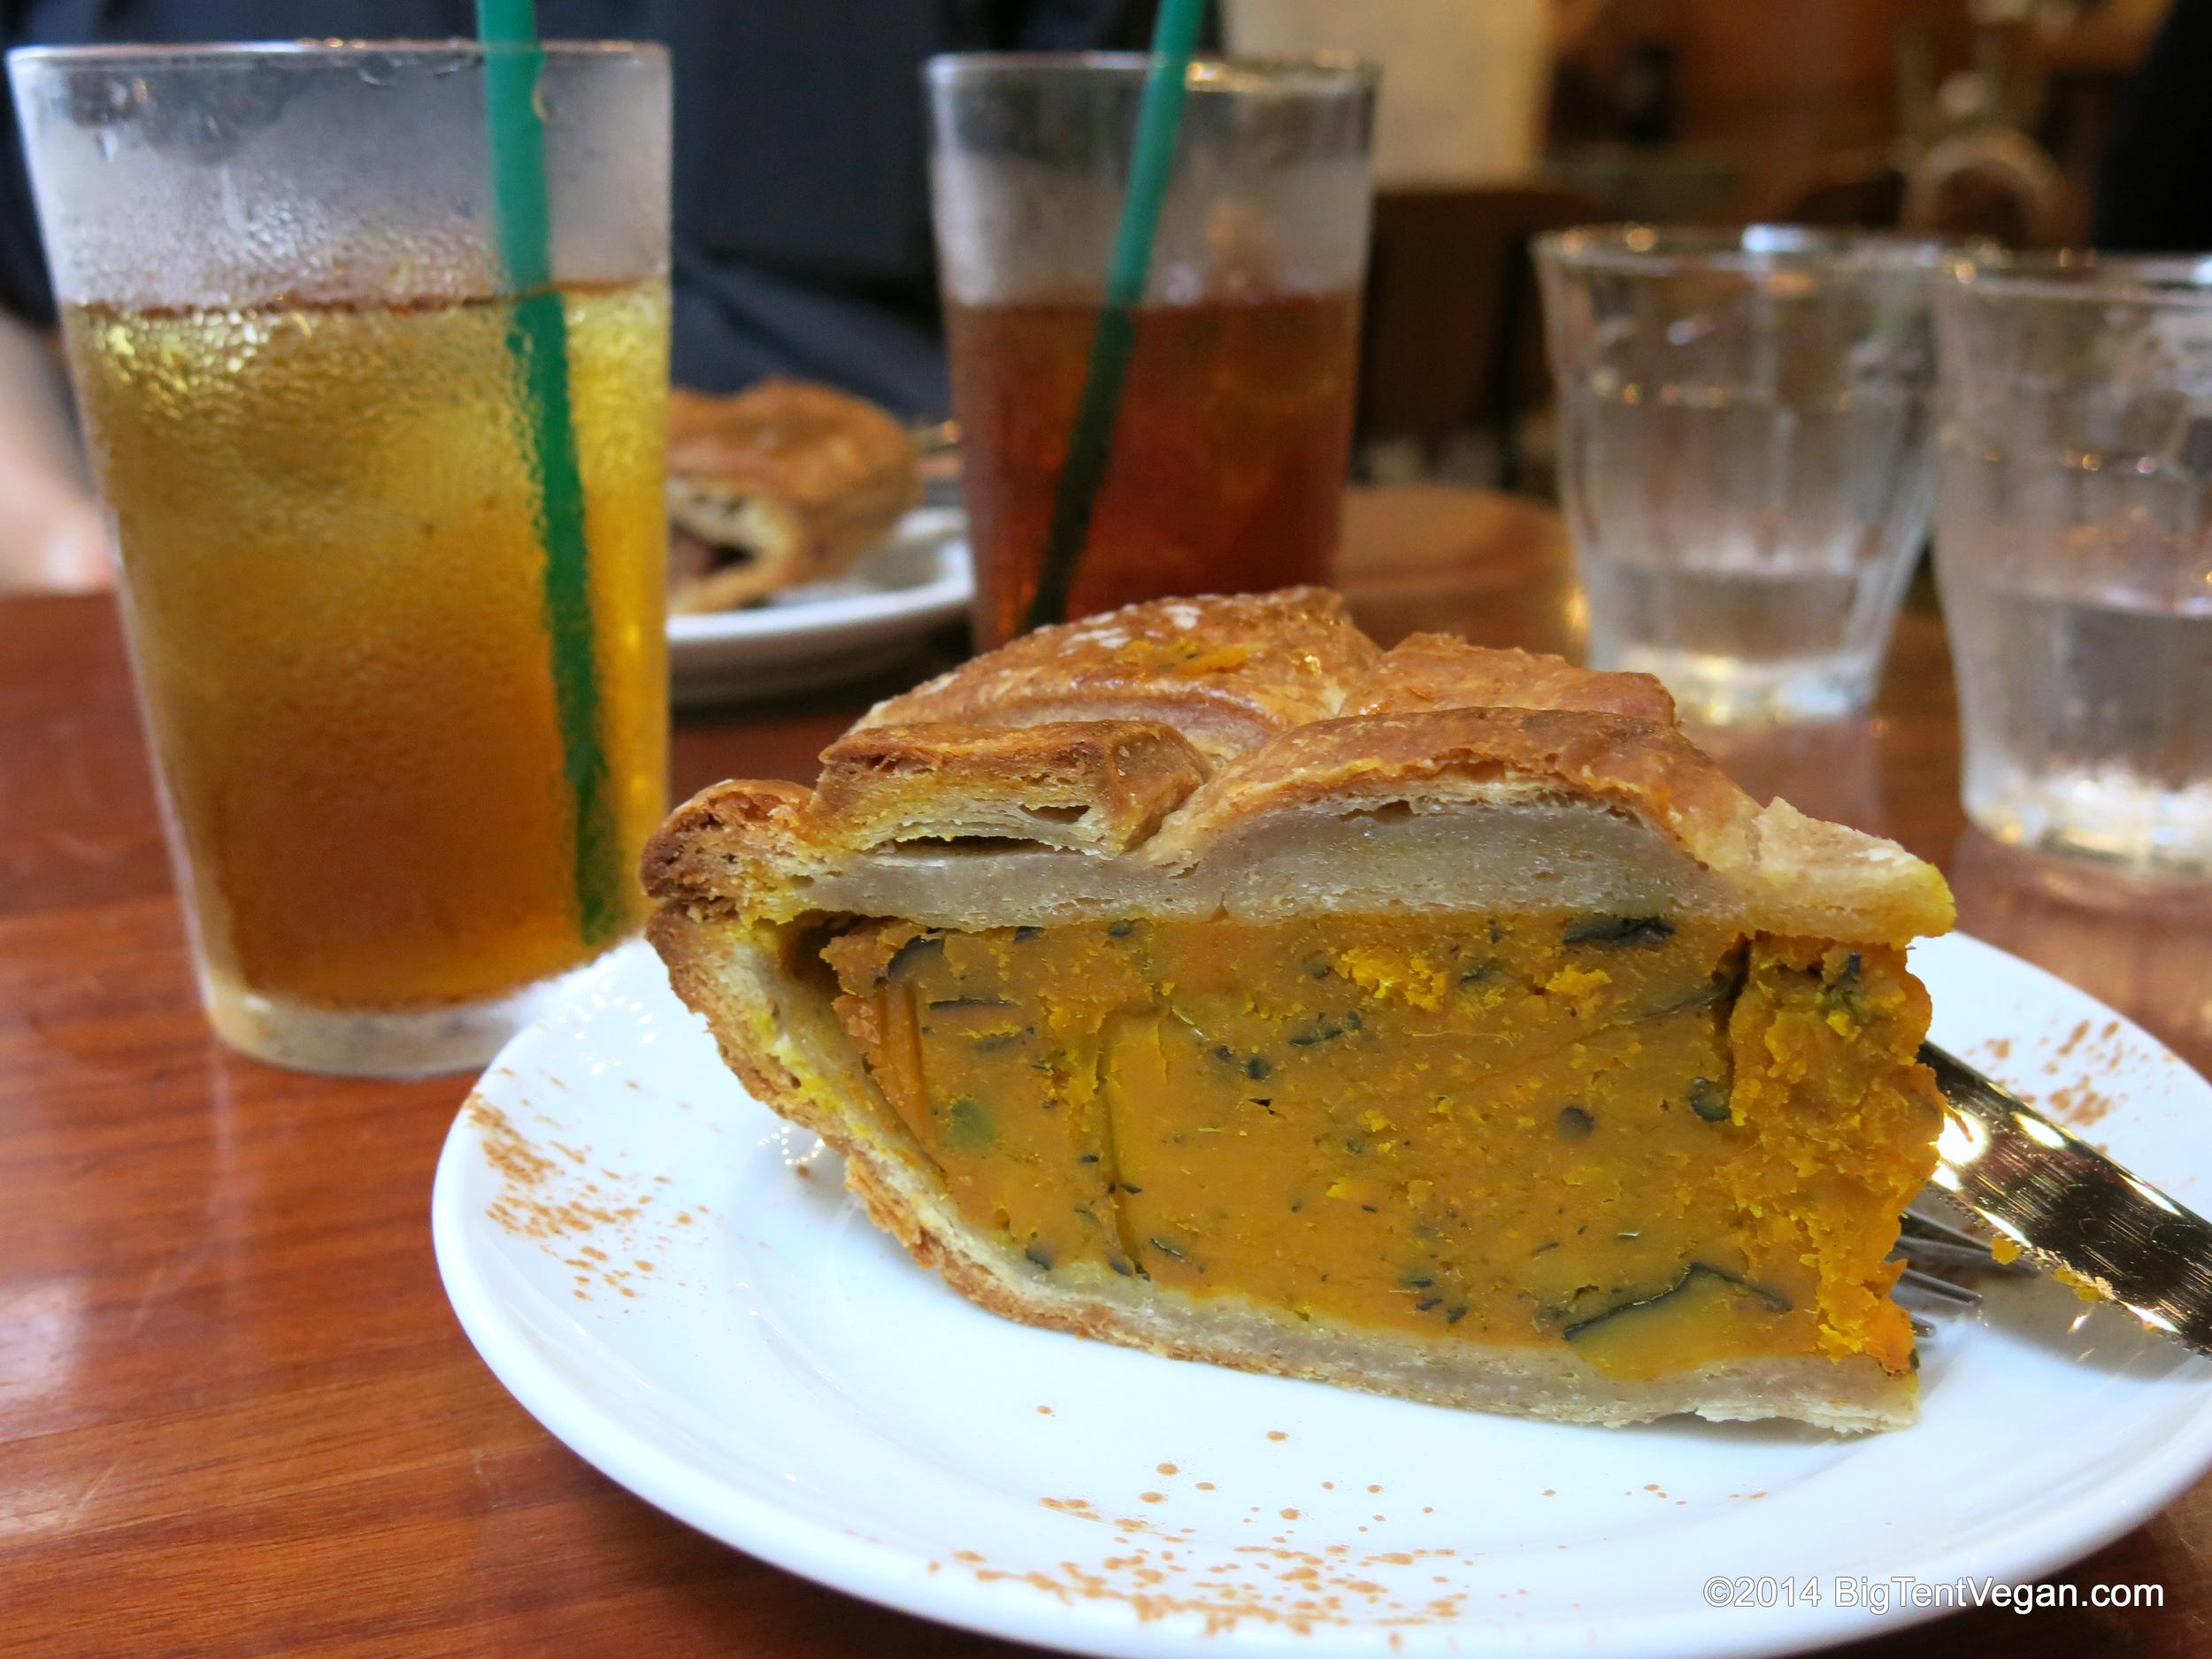 Vegan Pumpkin Pie from Eat More Greens (100% vegetarian and very vegan-friendly restaurant in Tokyo, Japan)